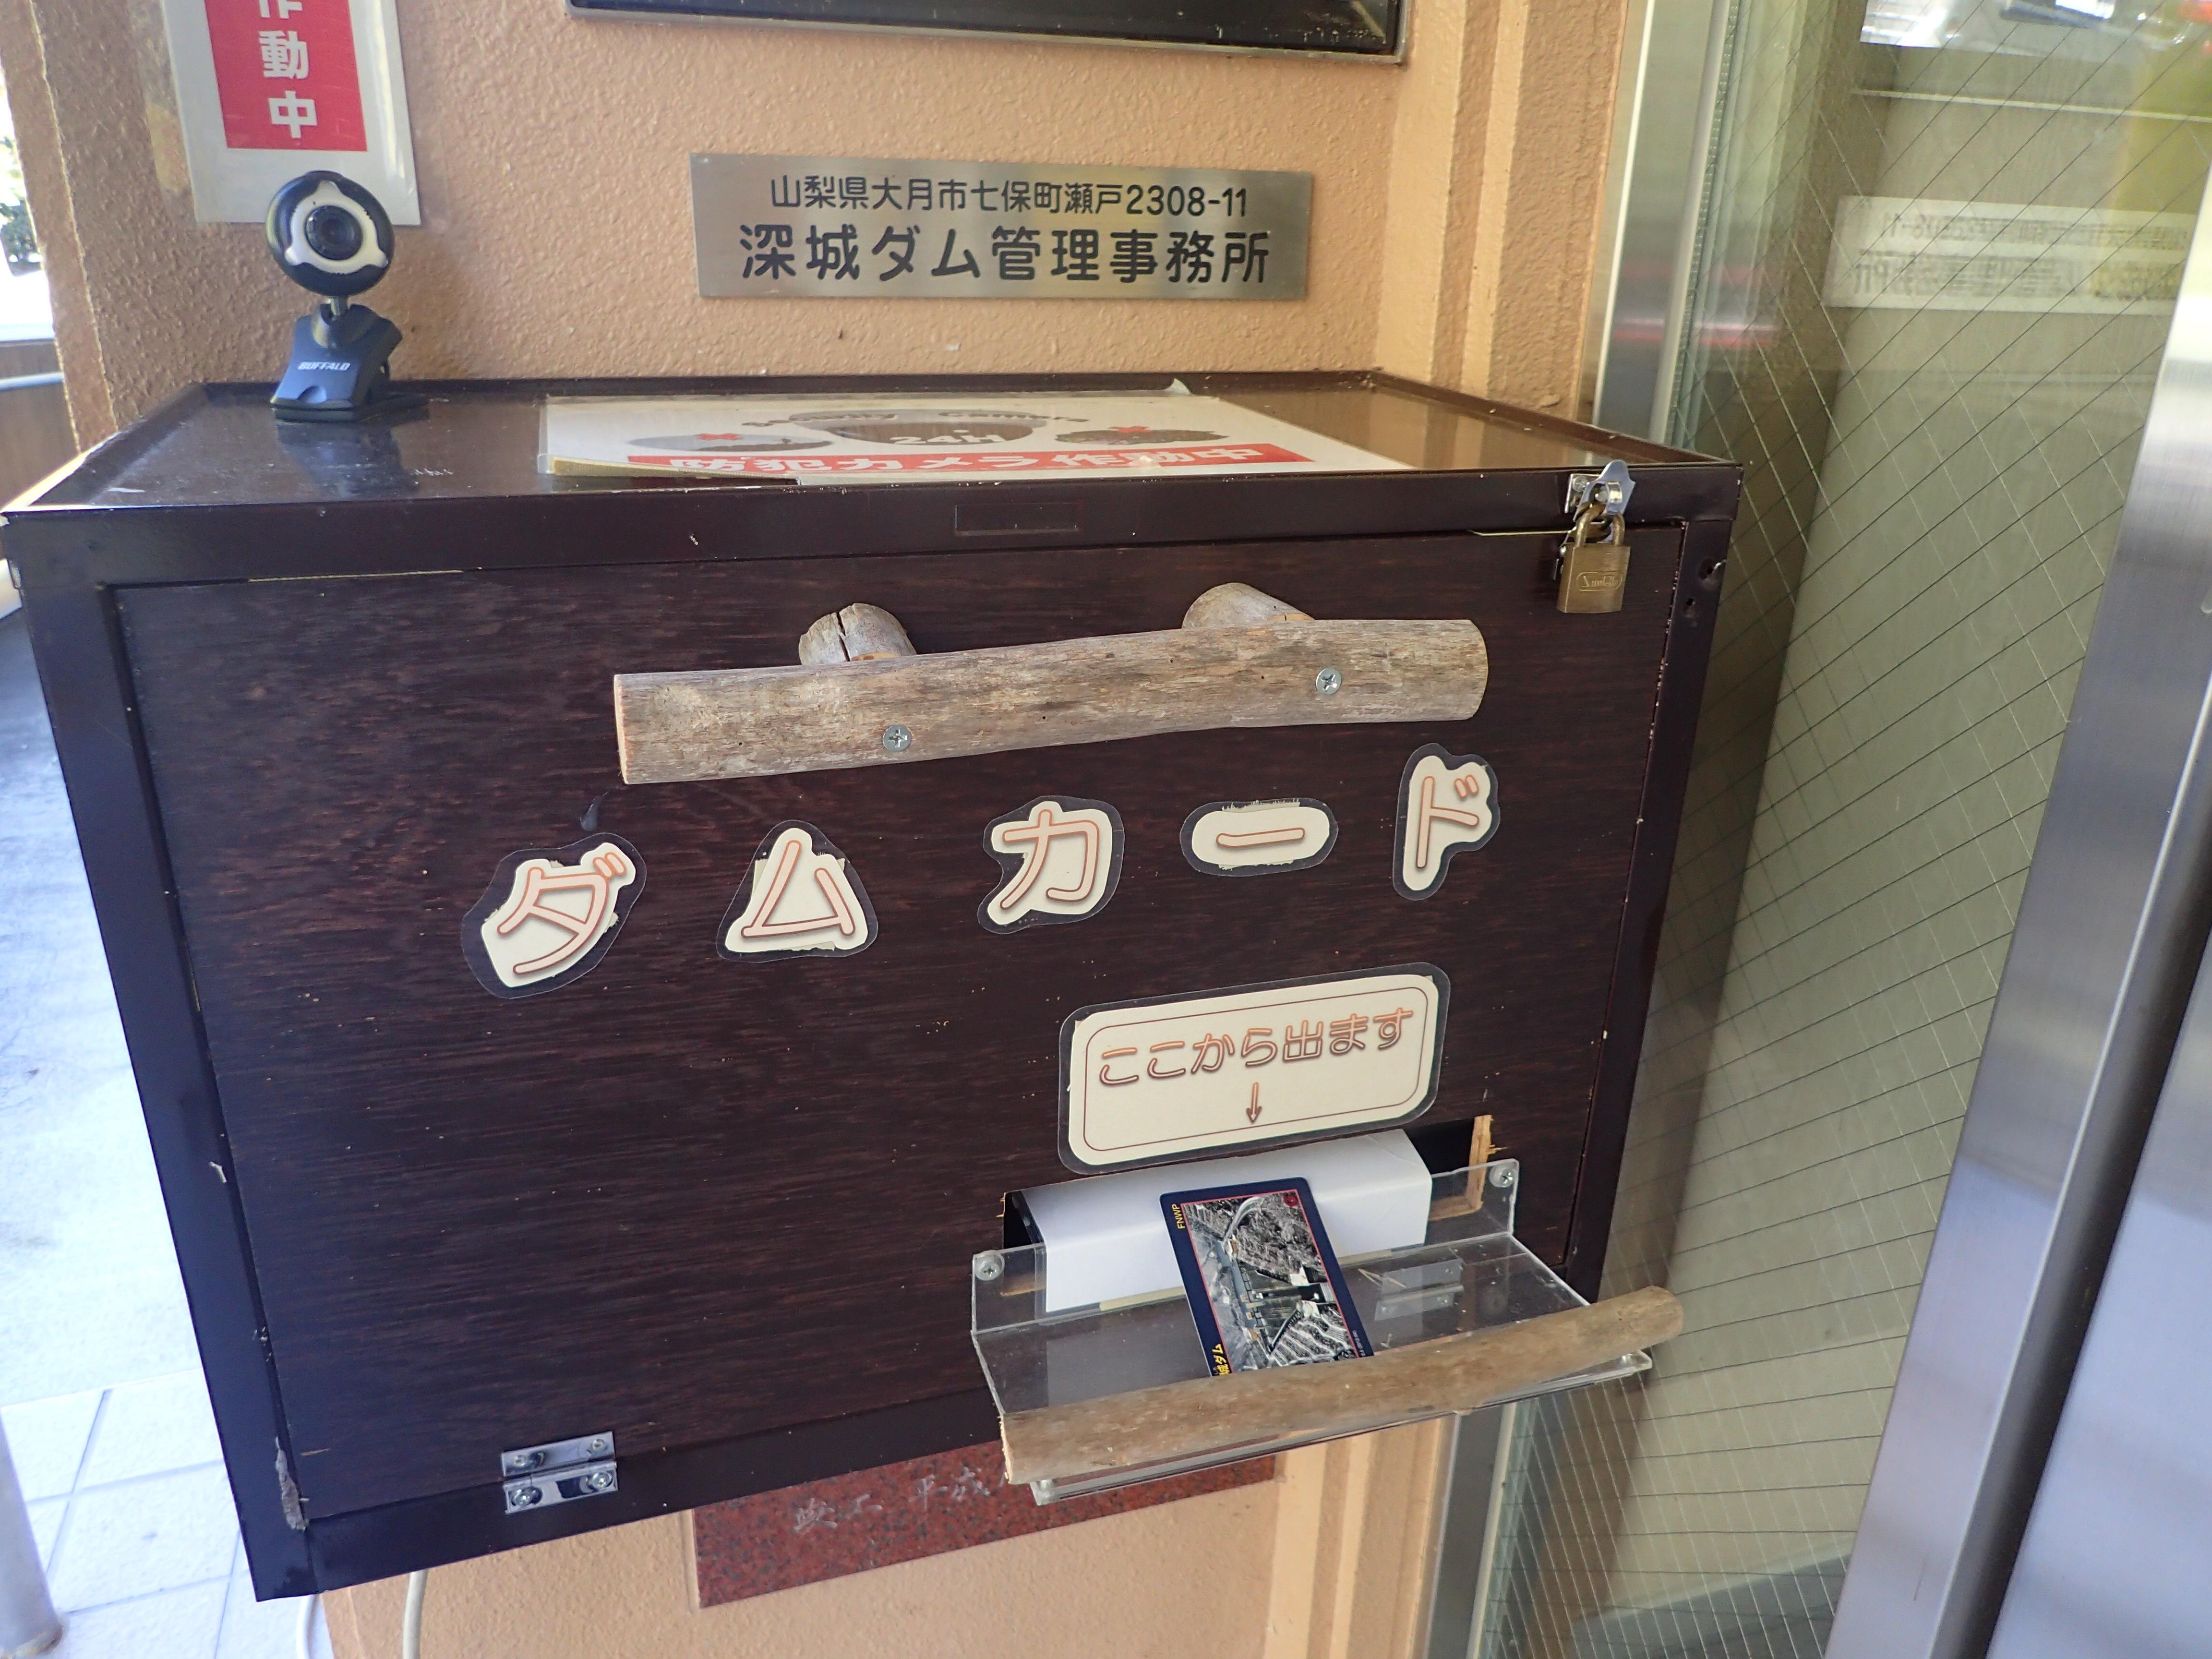 http://www.yamanashi-kankou.jp/blog/5G5fM9_PB010590.jpg